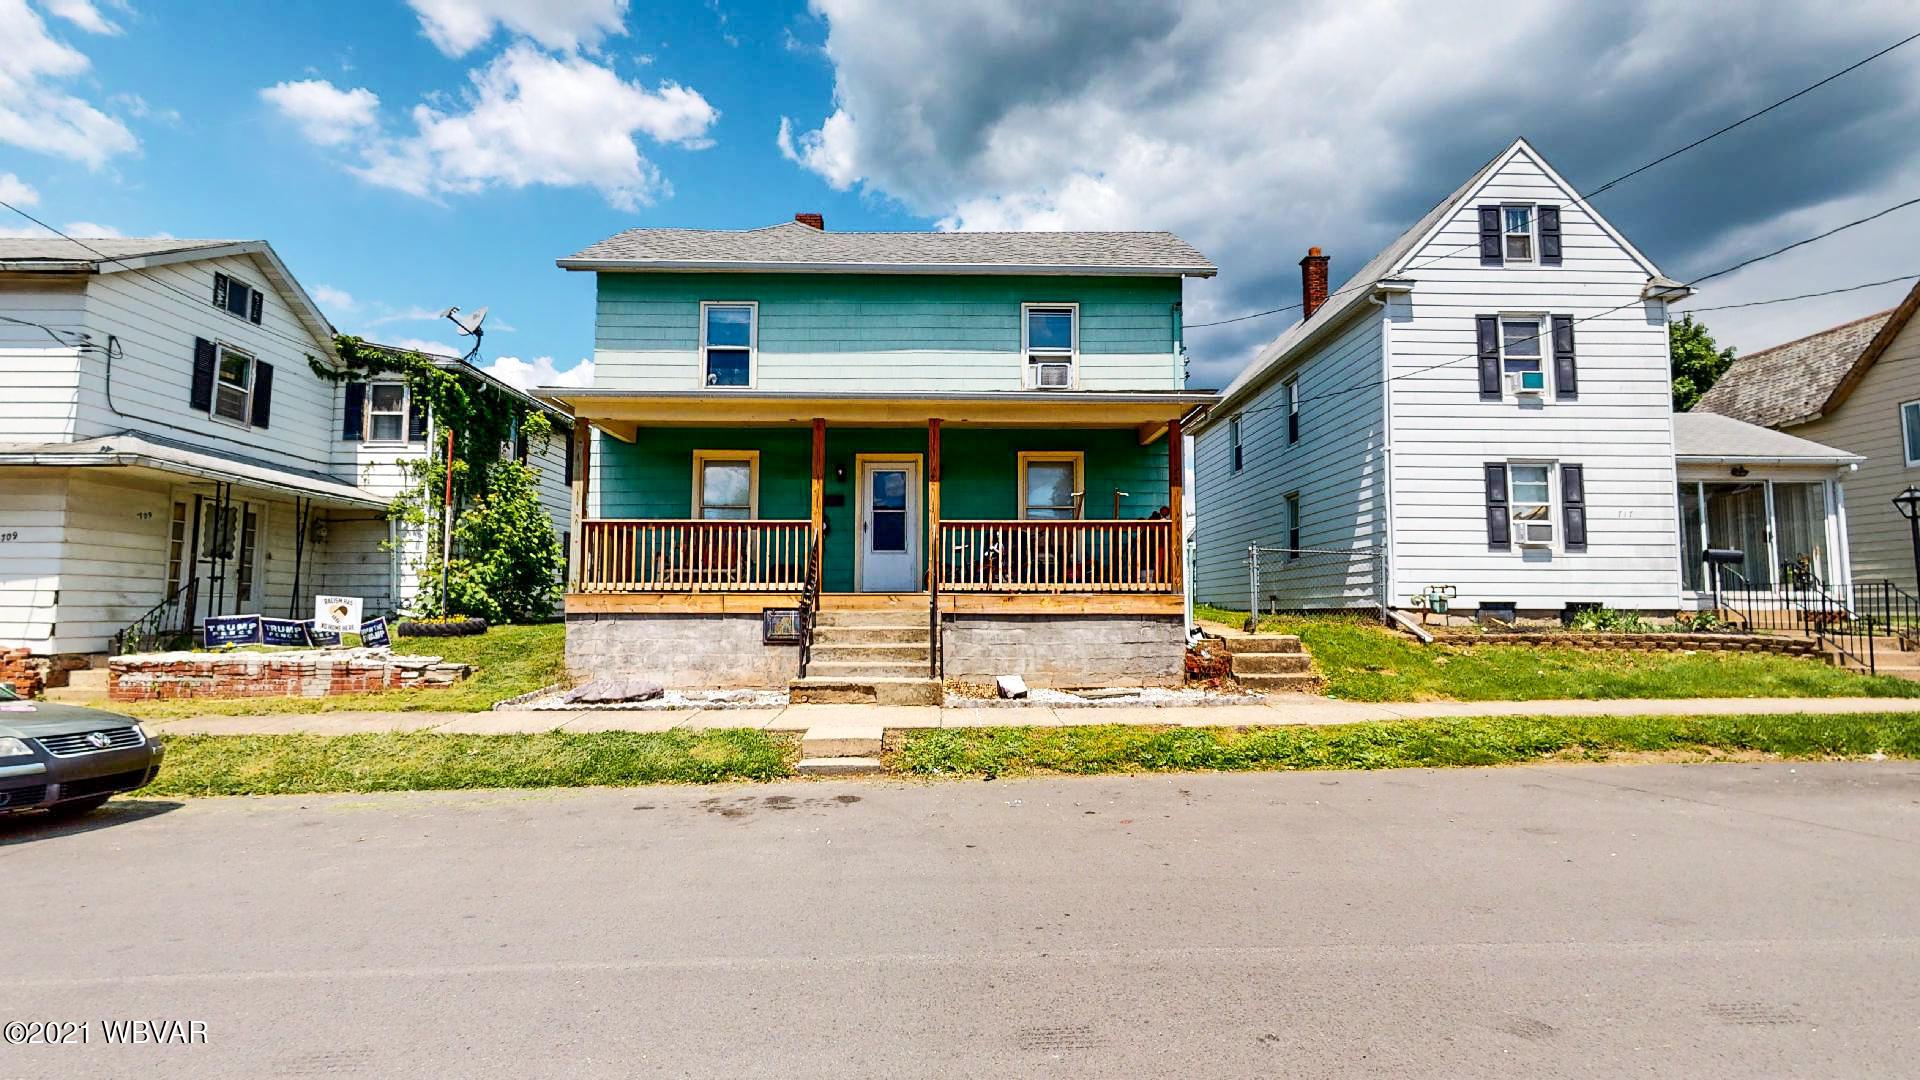 713 TUCKER STREET, Williamsport, PA 17701, 3 Bedrooms Bedrooms, ,1 BathroomBathrooms,Residential,For sale,TUCKER,WB-92533